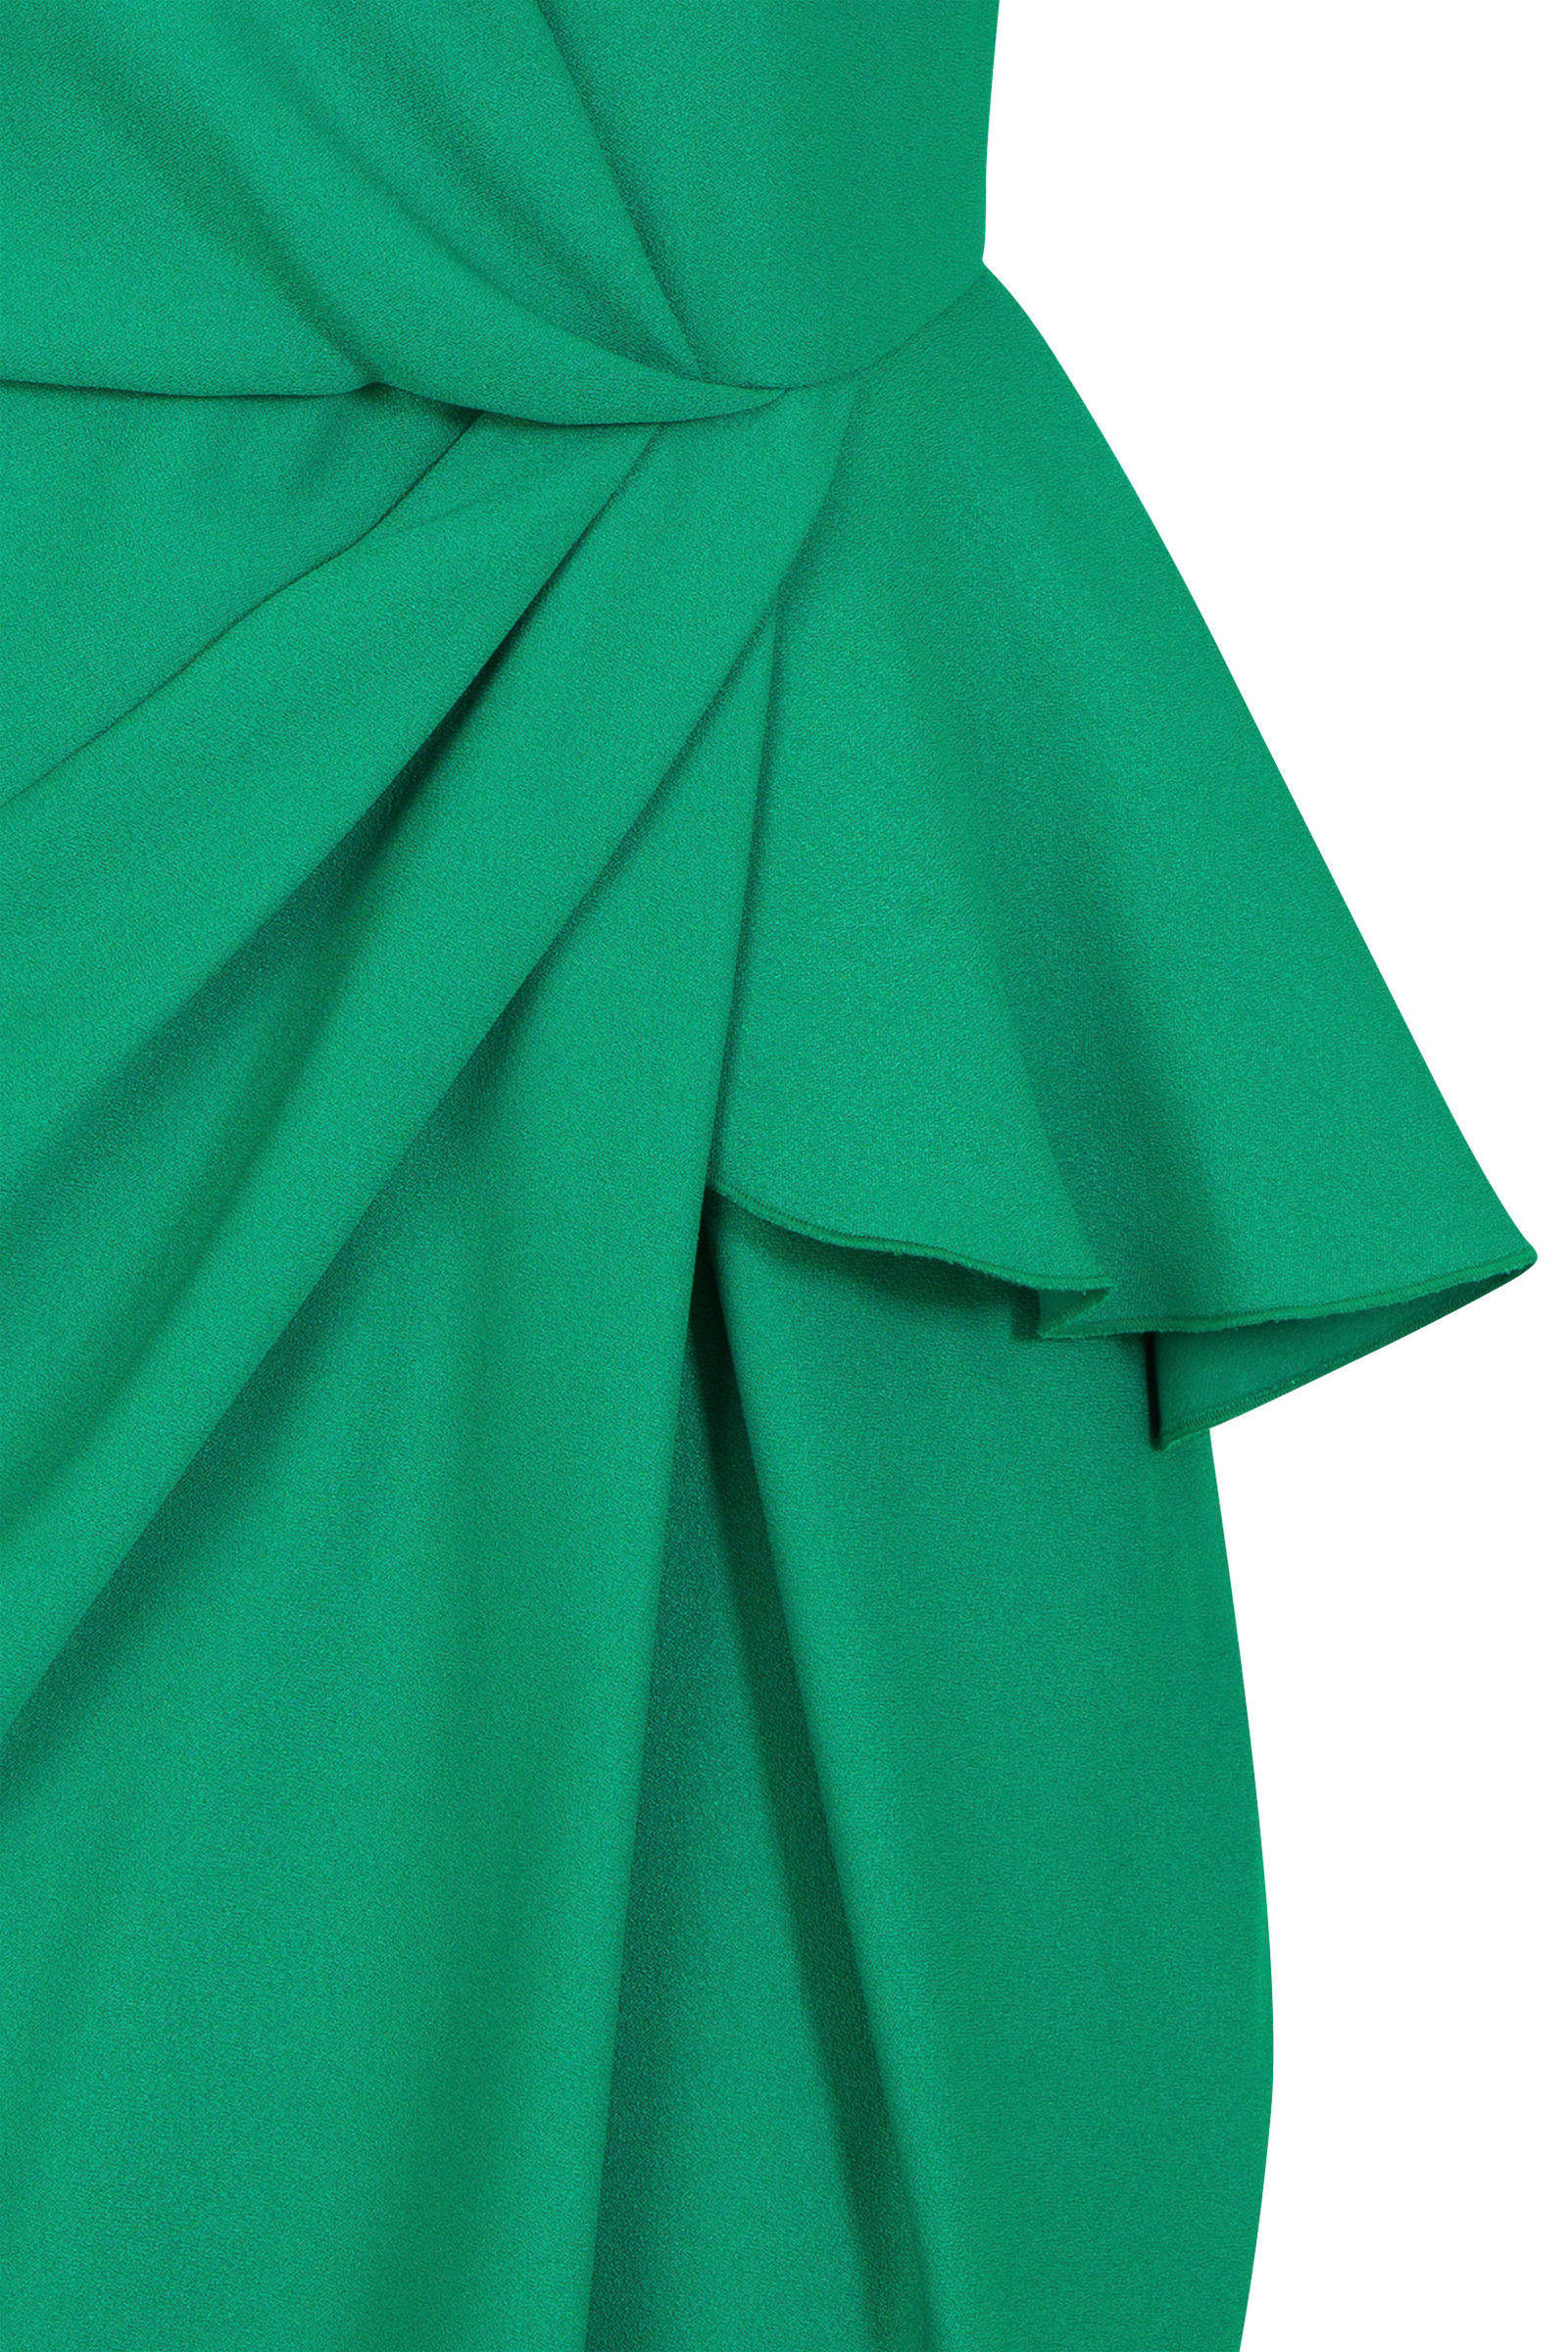 groen jurk Steps jurk groen jurk Steps jurk Steps groen Steps groen AwqCfZn